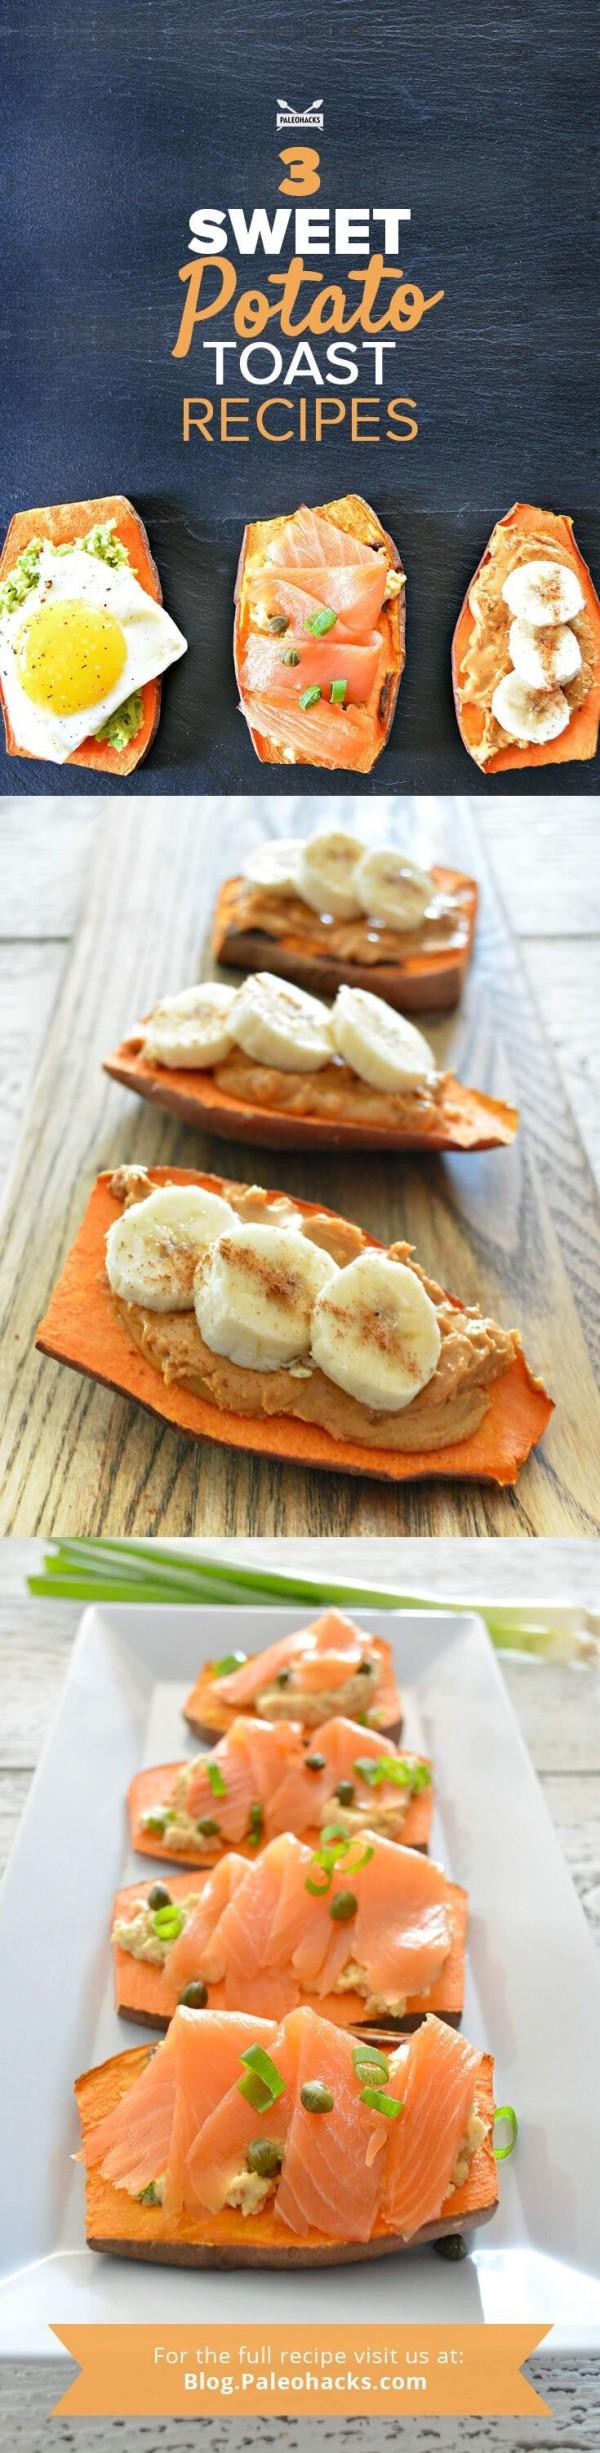 Check out this recipe for breakfast sweet potato toast. Yummy! #RecipeIdeas @recipes_to_go